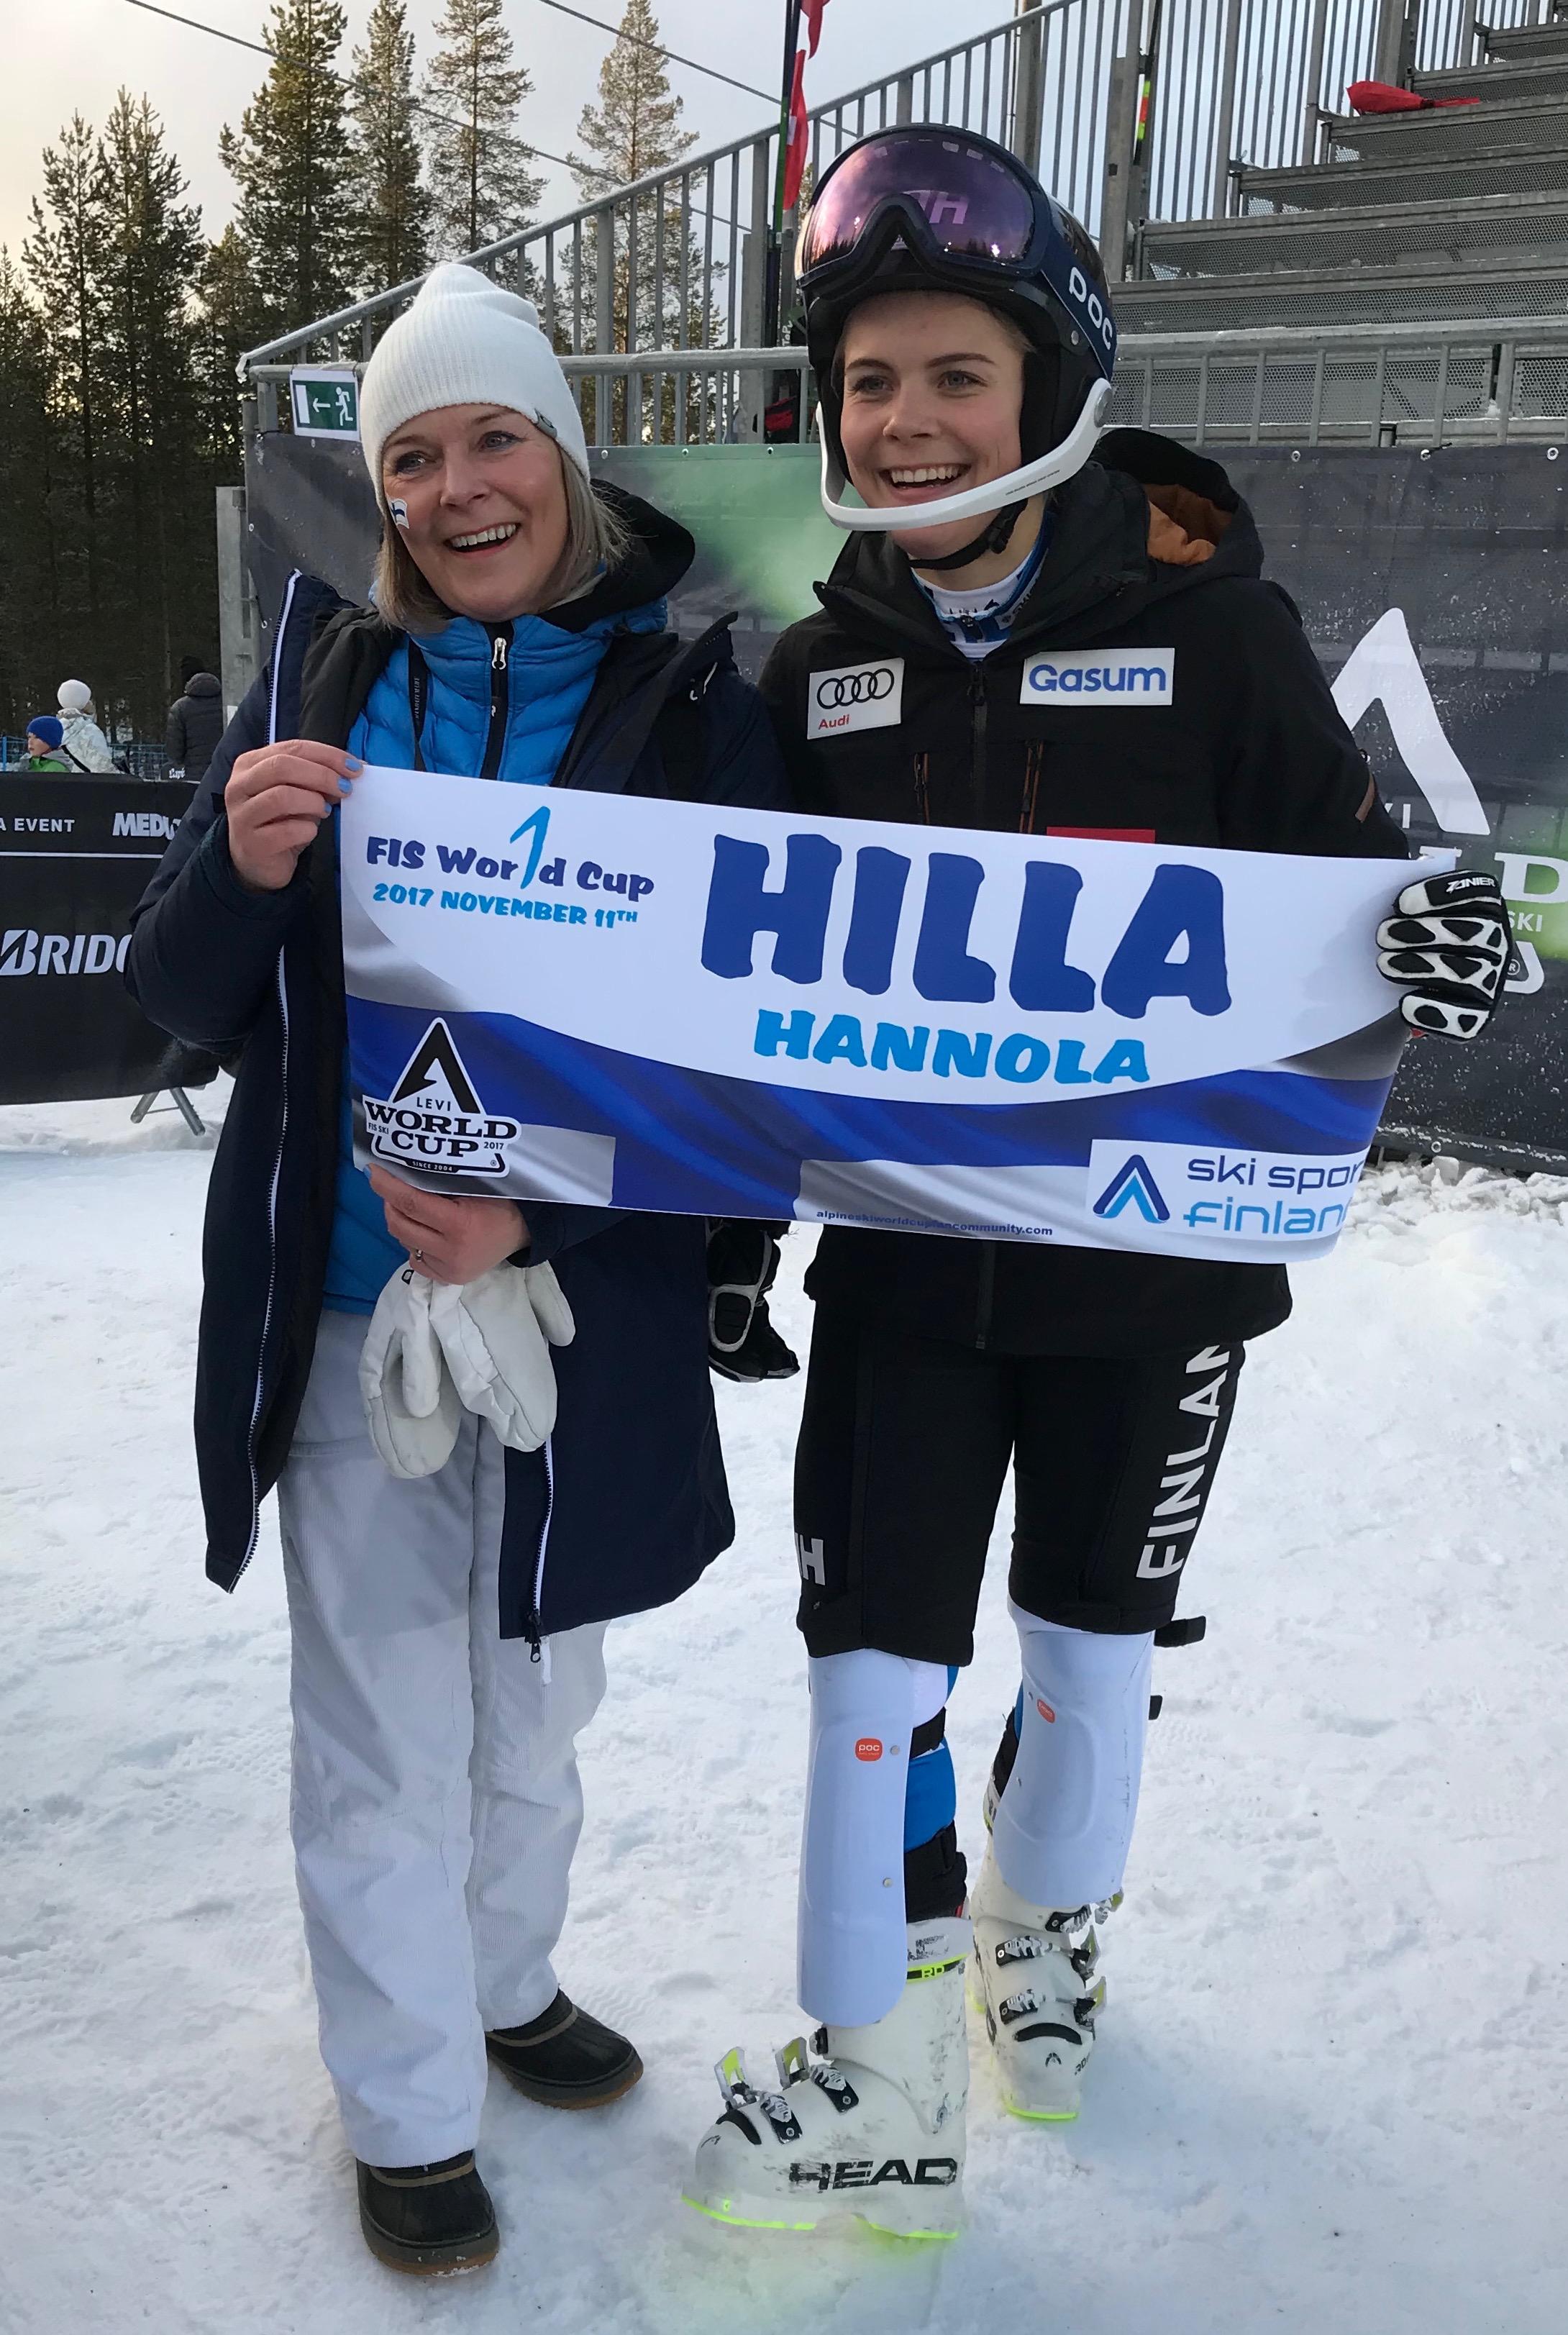 Hilla HANNOLA First World Cup start